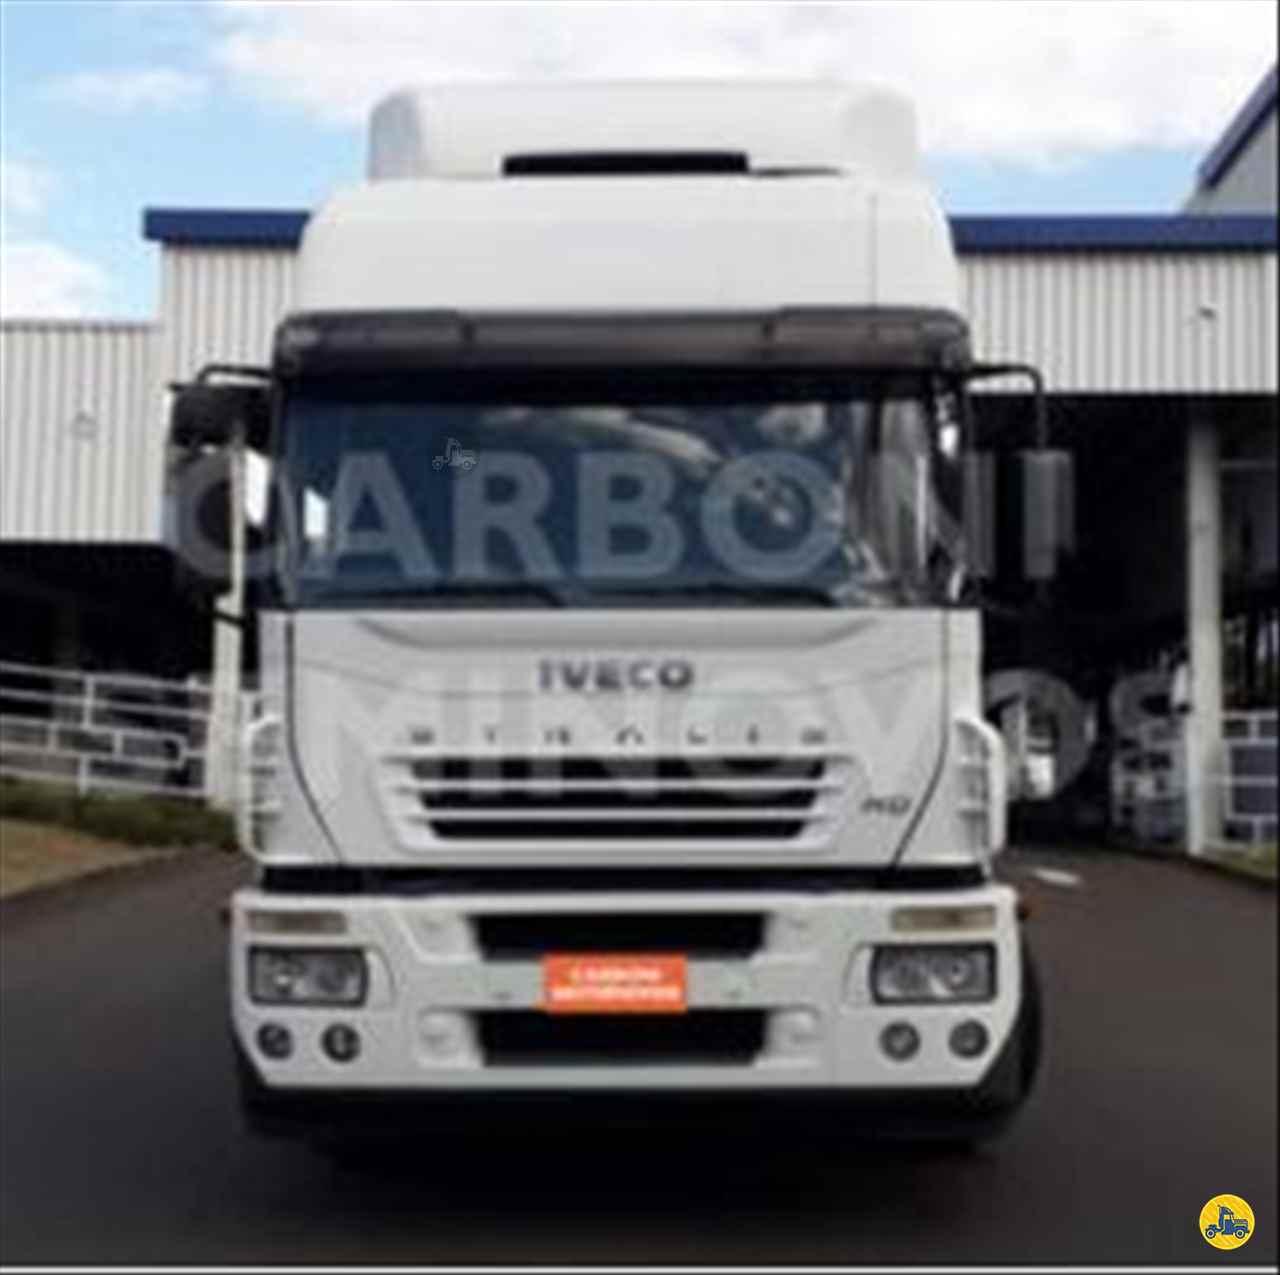 CAMINHAO IVECO STRALIS 380 Cavalo Mecânico Truck 6x2 Carboni Iveco VIDEIRA SANTA CATARINA SC